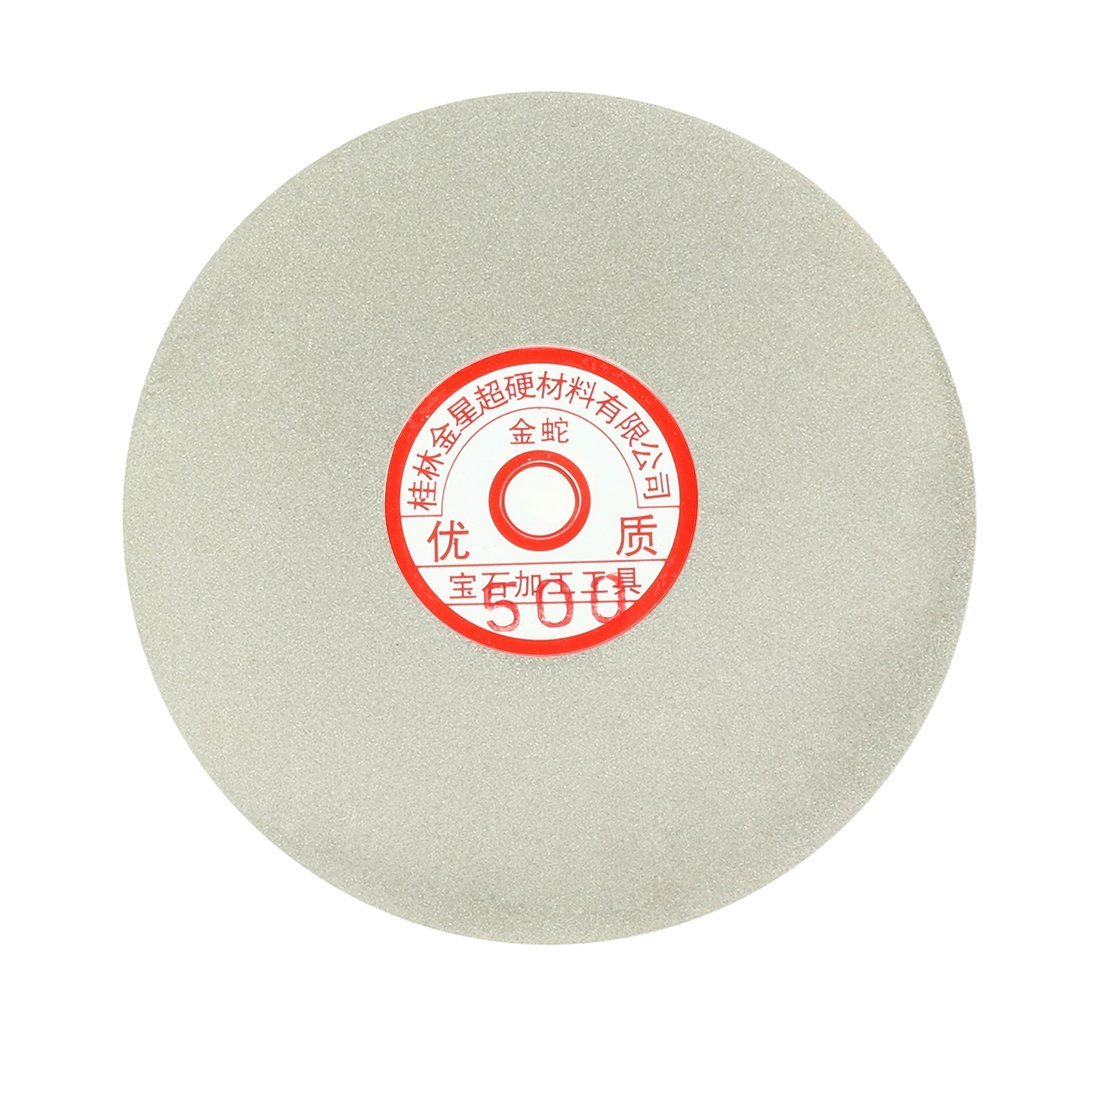 Sourcingmap 6-inch Grit 500 Diamond Coated Flat Lap Wheel Grinding Sanding Polishing Disc a17030900ux1371